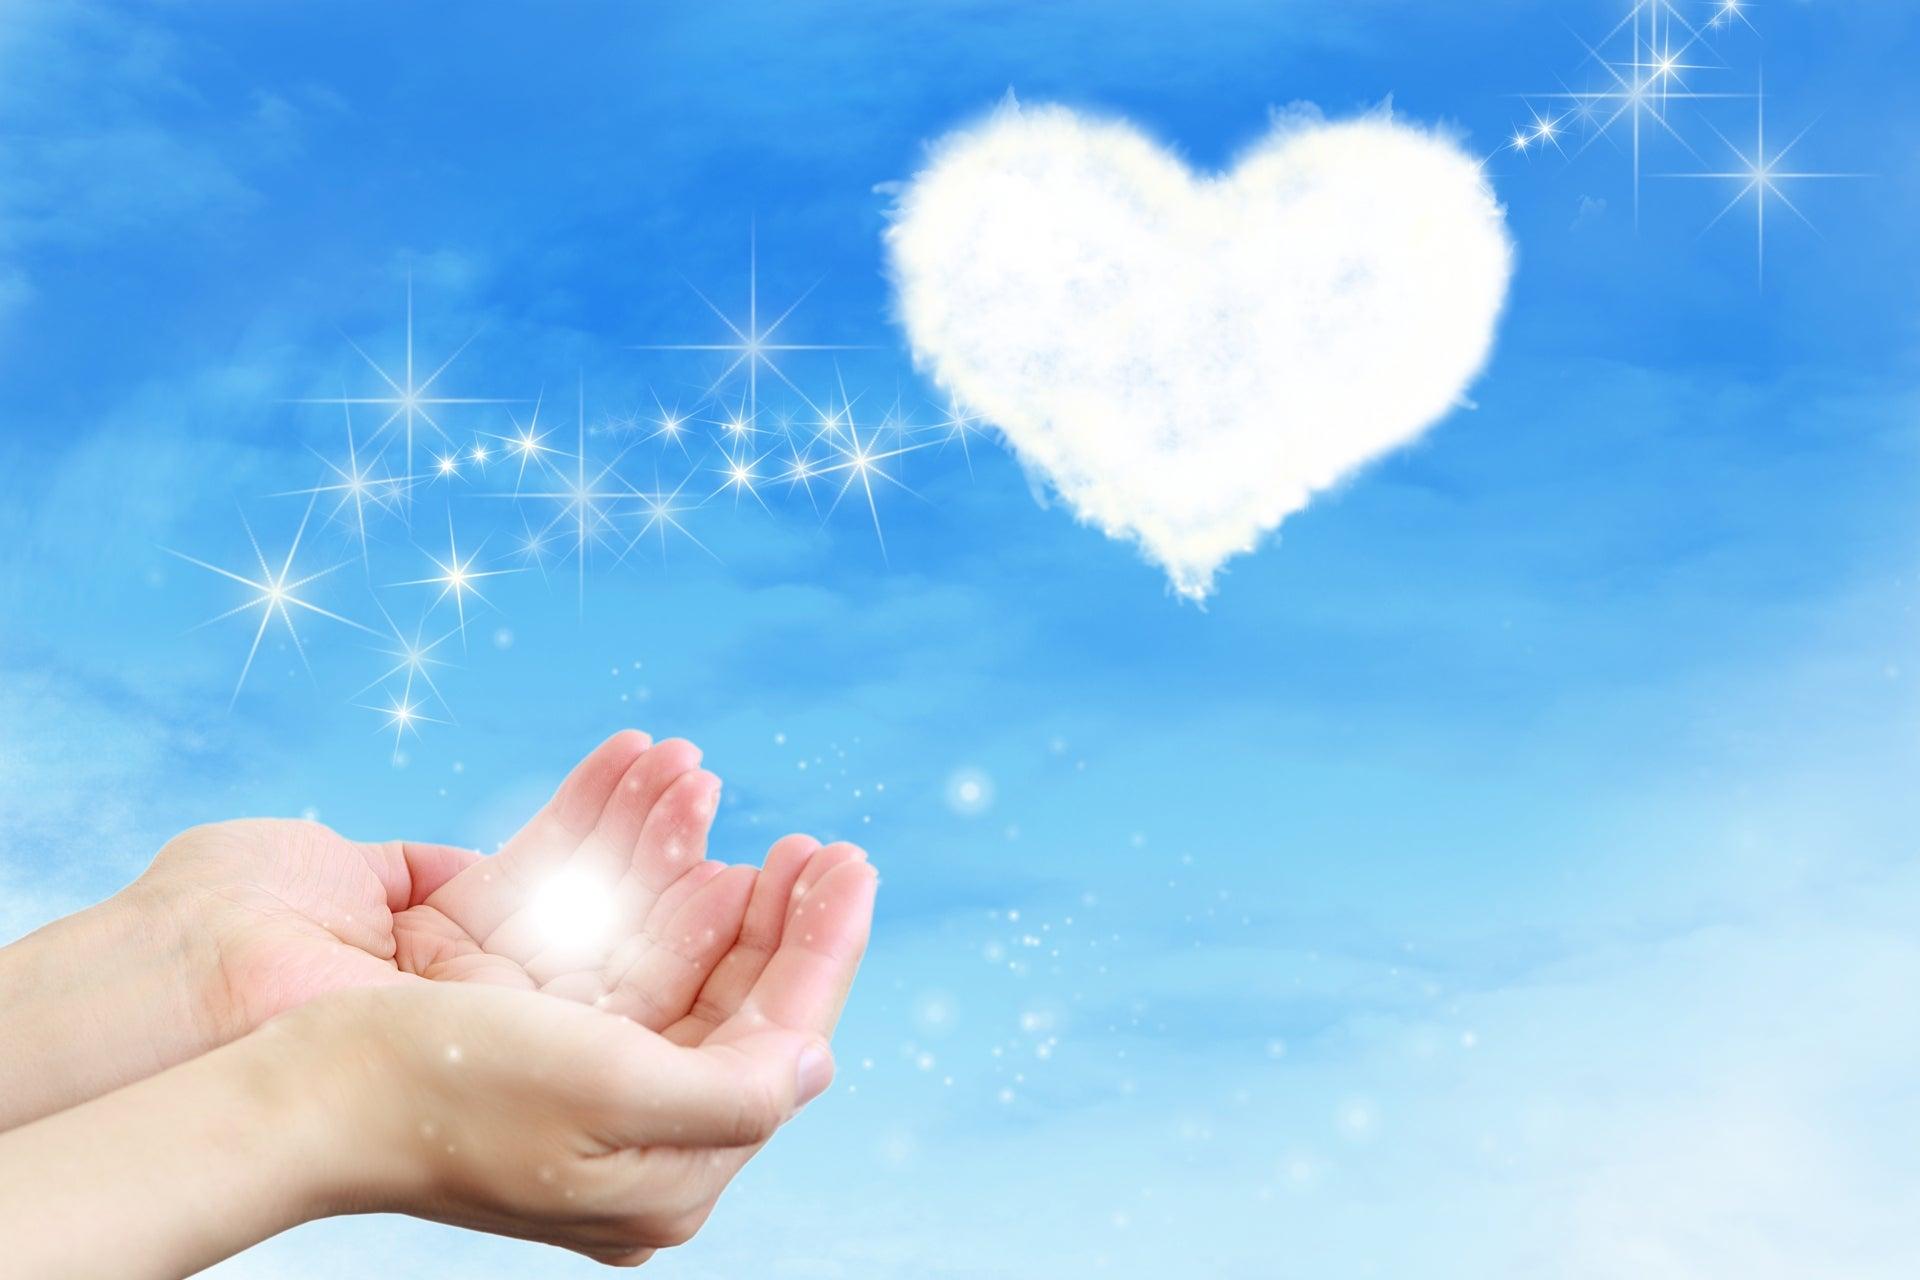 o1920128014384959191 - 夫婦関係を修復・・・愛を伝える5つの言語